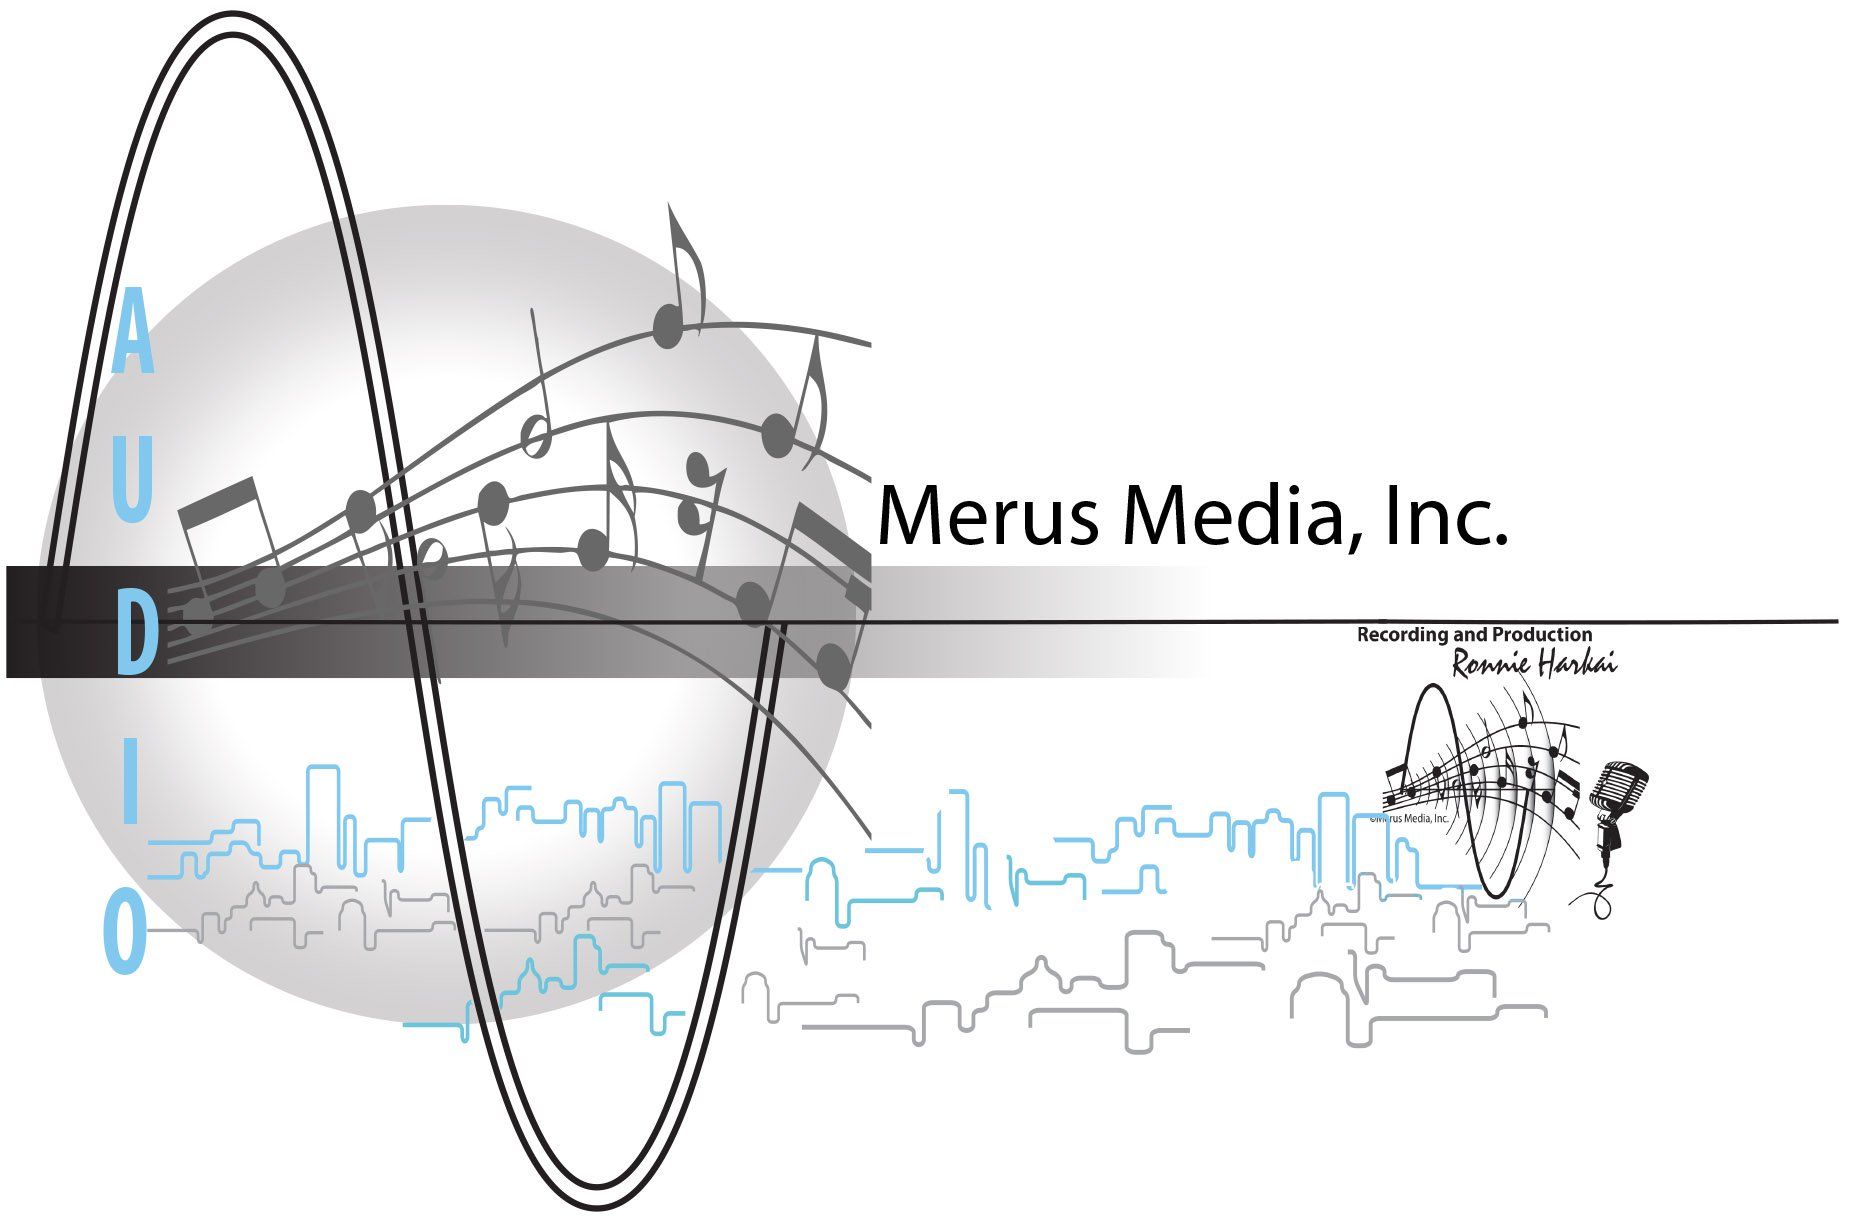 Merus Media